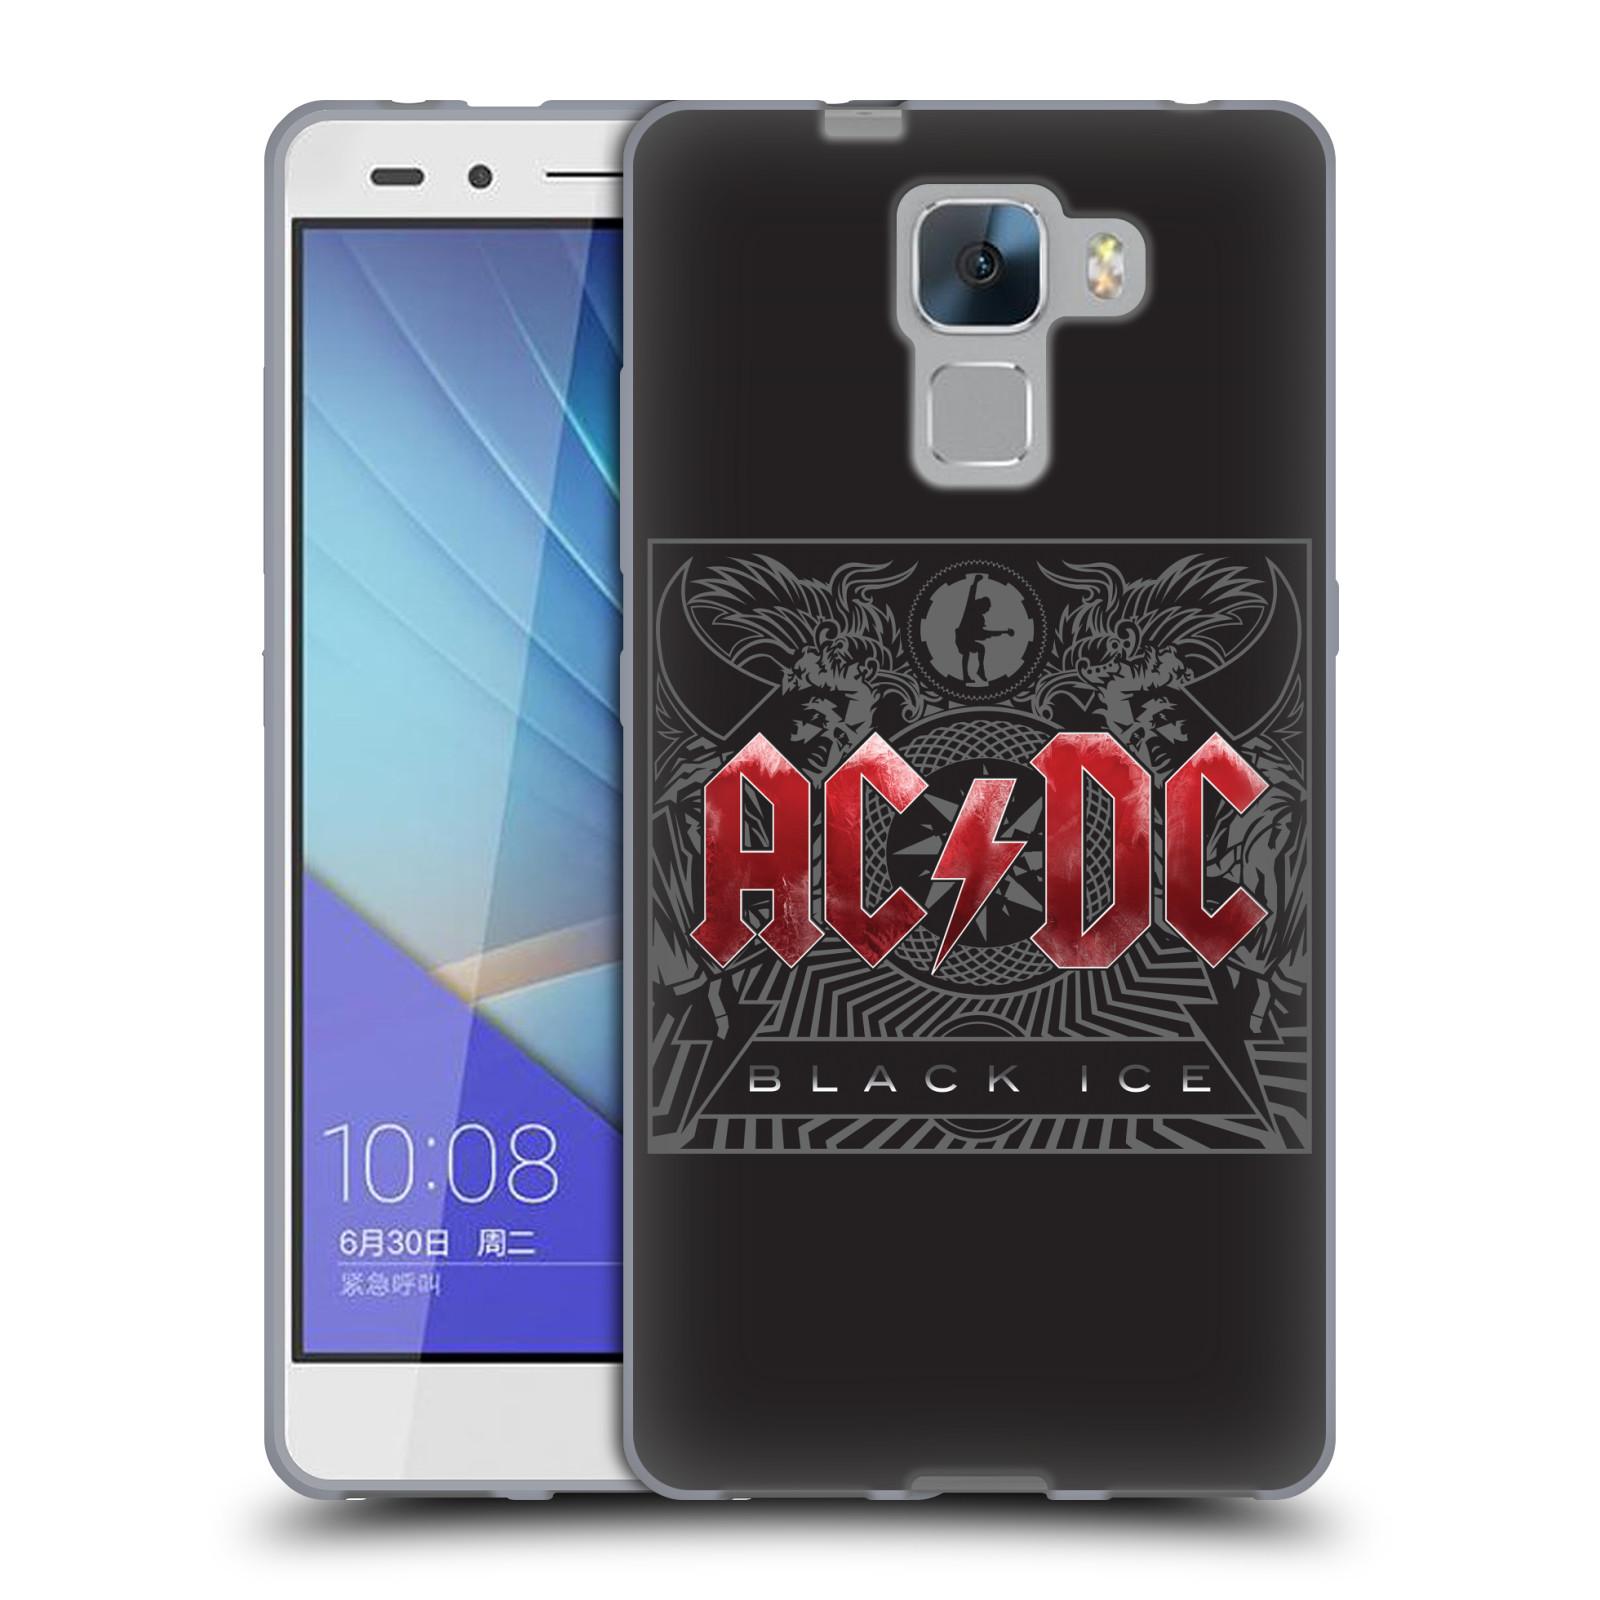 Silikonové pouzdro na mobil Honor 7 HEAD CASE AC/DC Black Ice